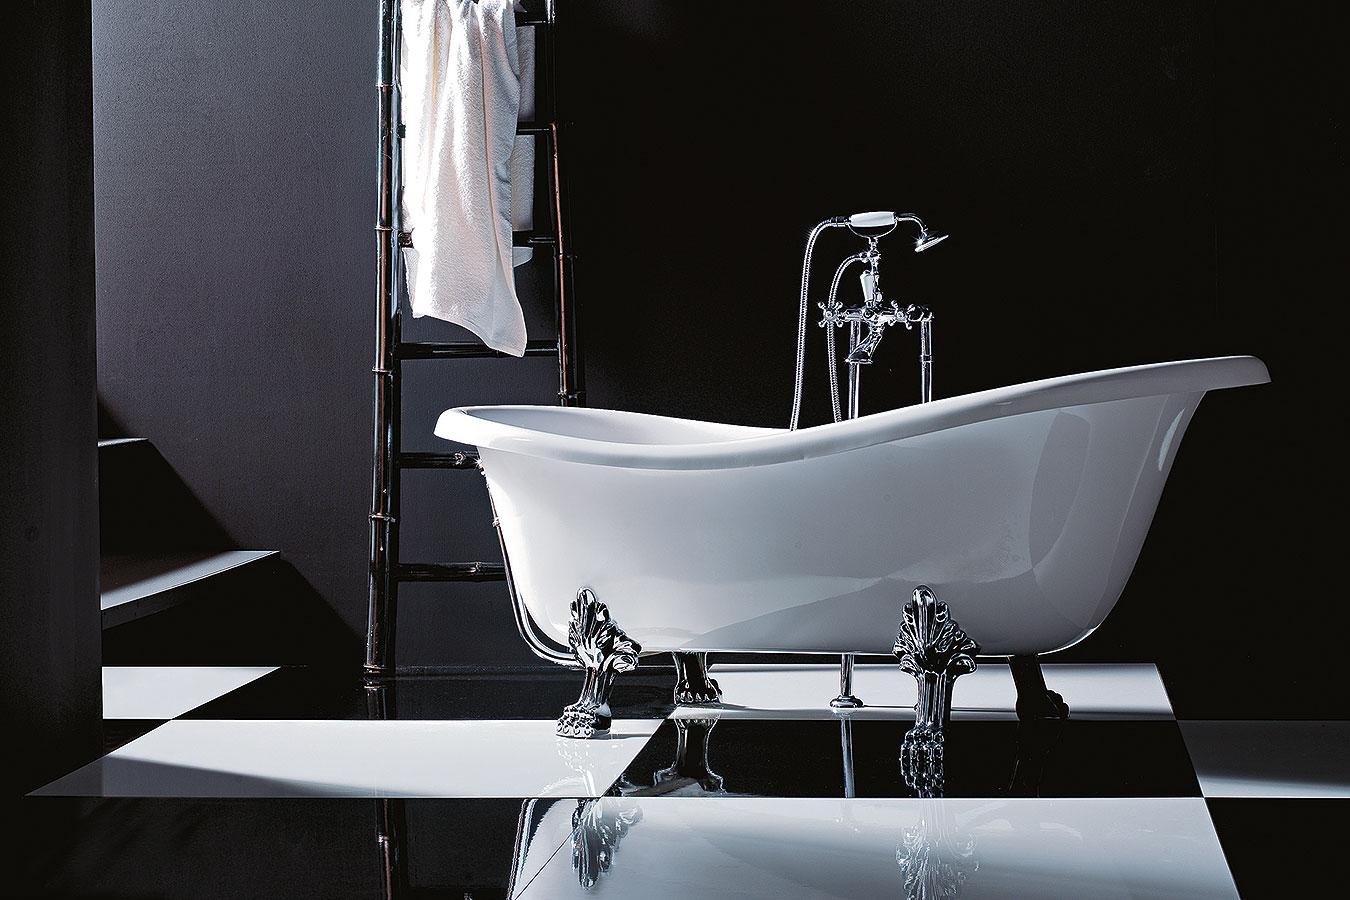 Vasca Da Bagno Sinonimo : Vasche da bagno arredo bagno venezia padovapandolfo